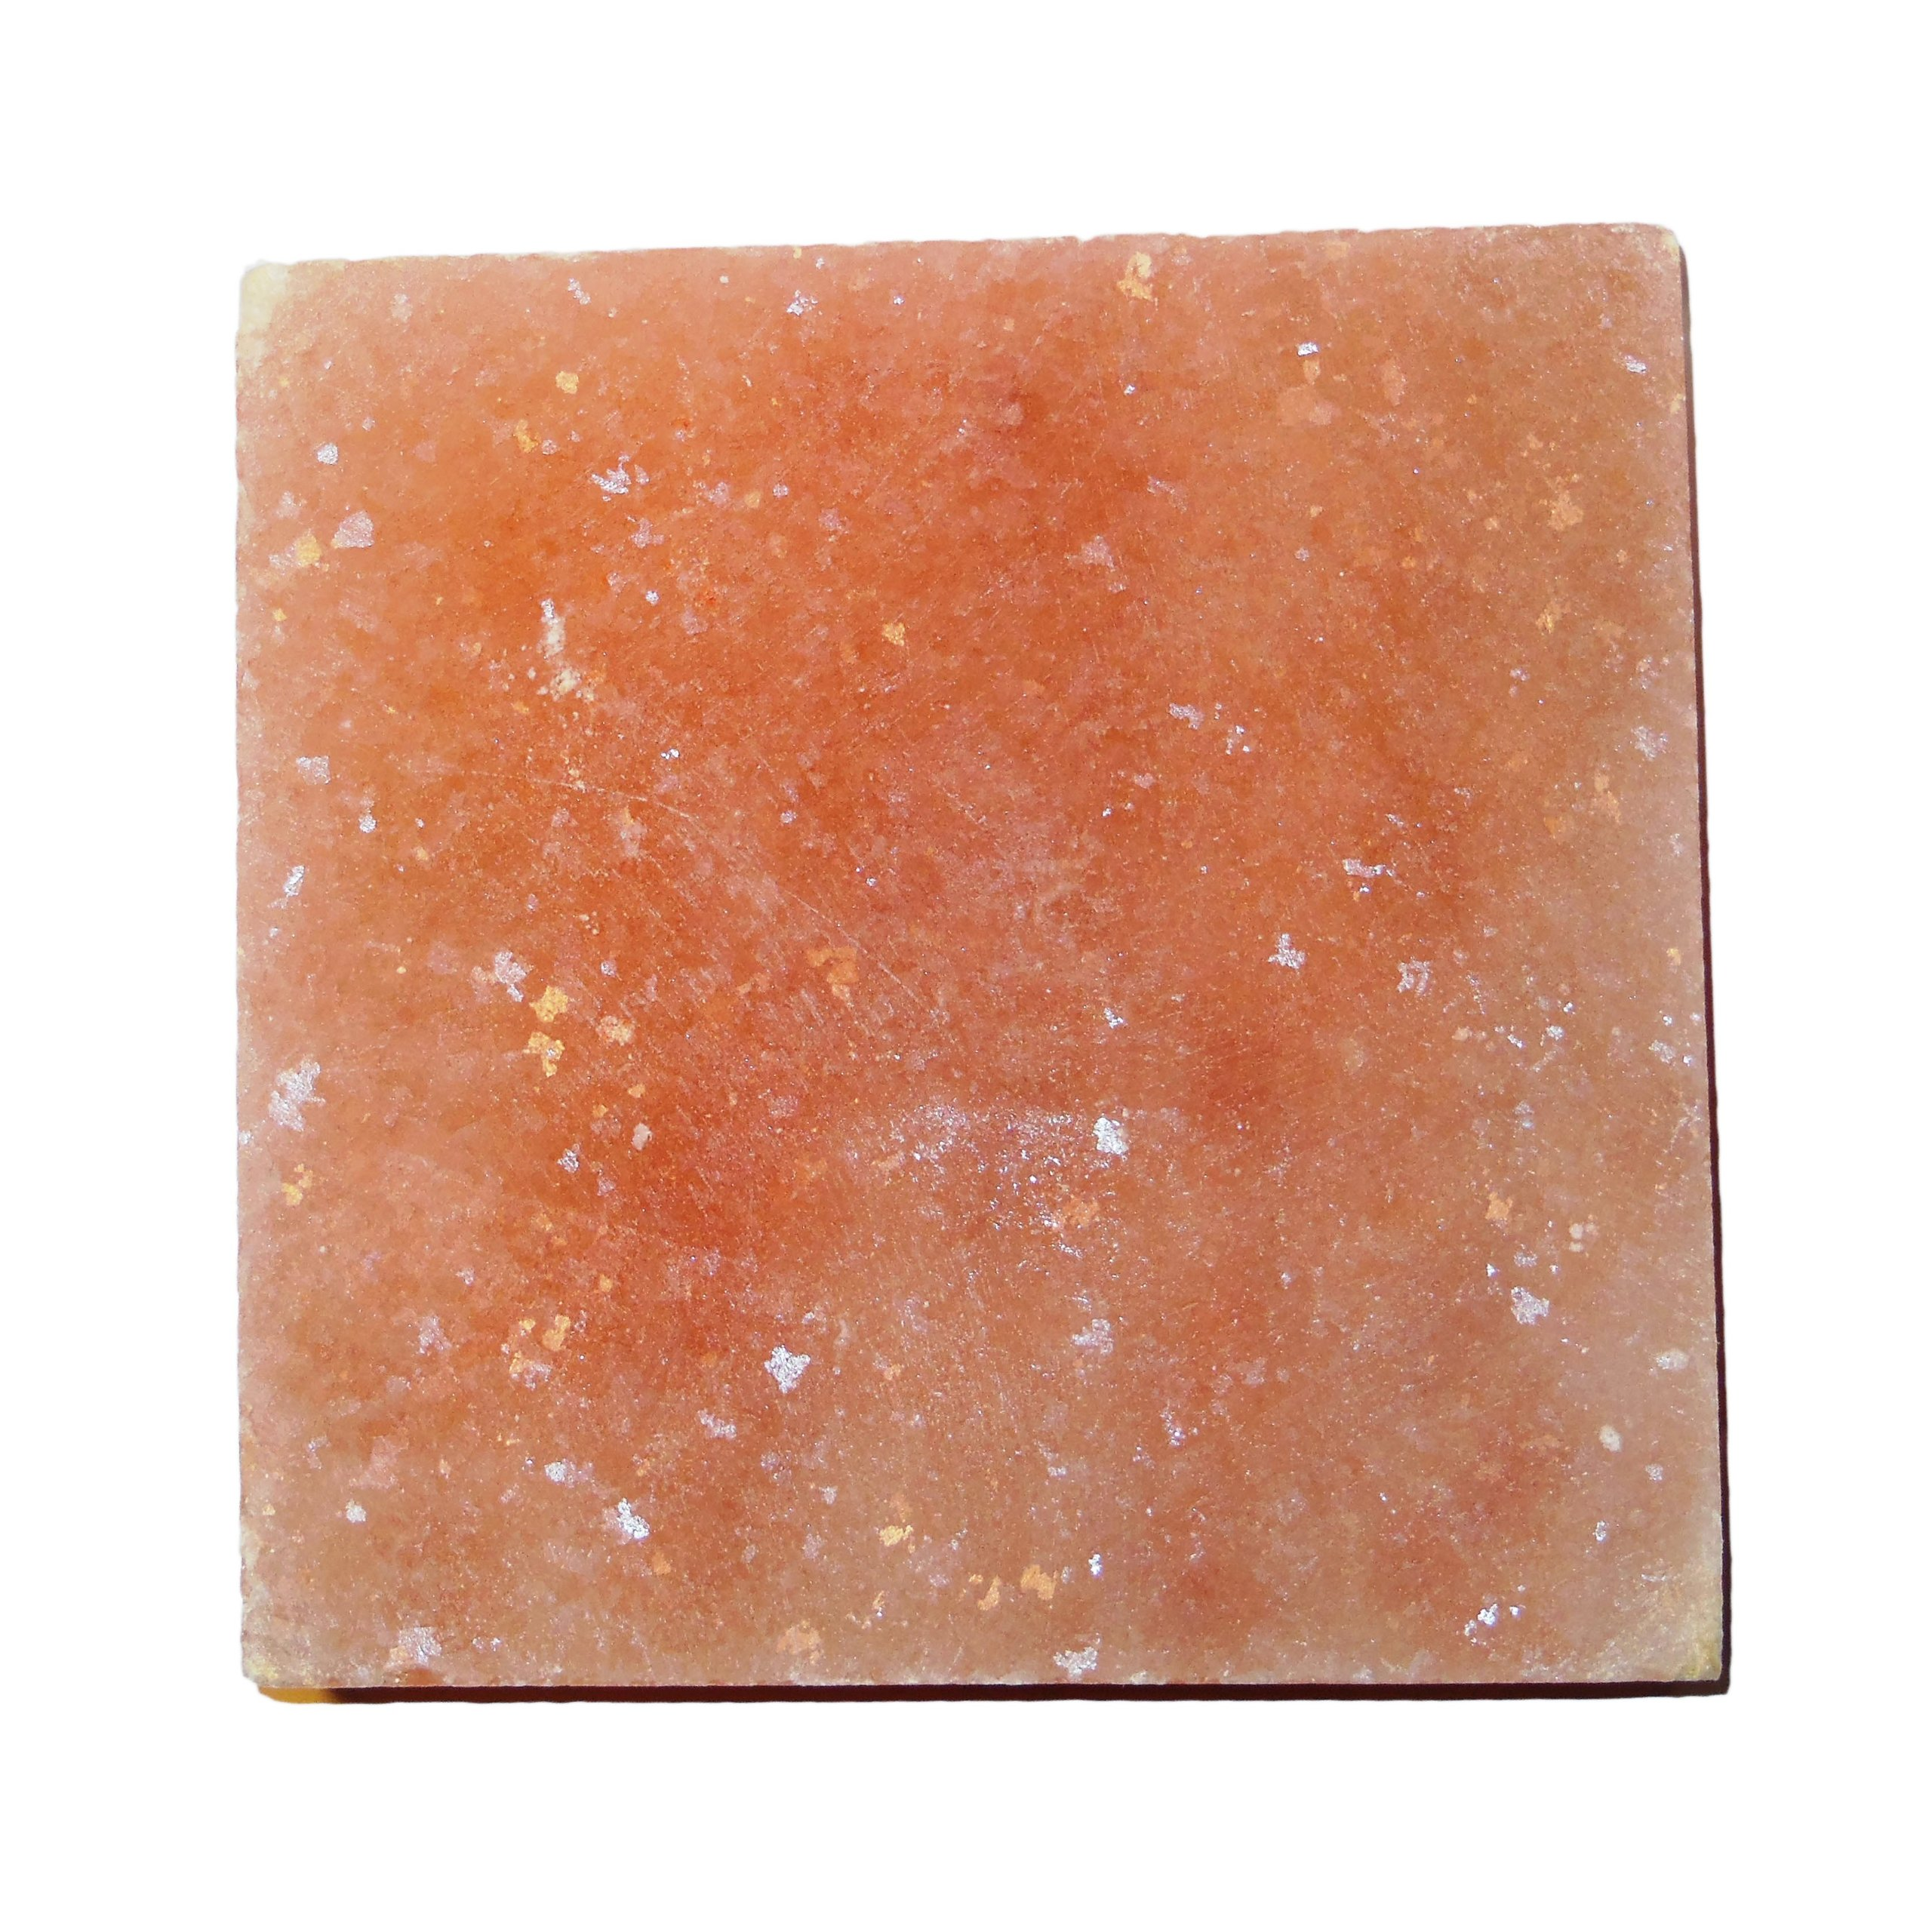 Natural Himalayan Salt Plate / Slab / Block Pink Square 8x8x2-Inch by SaltSkil (Image #4)